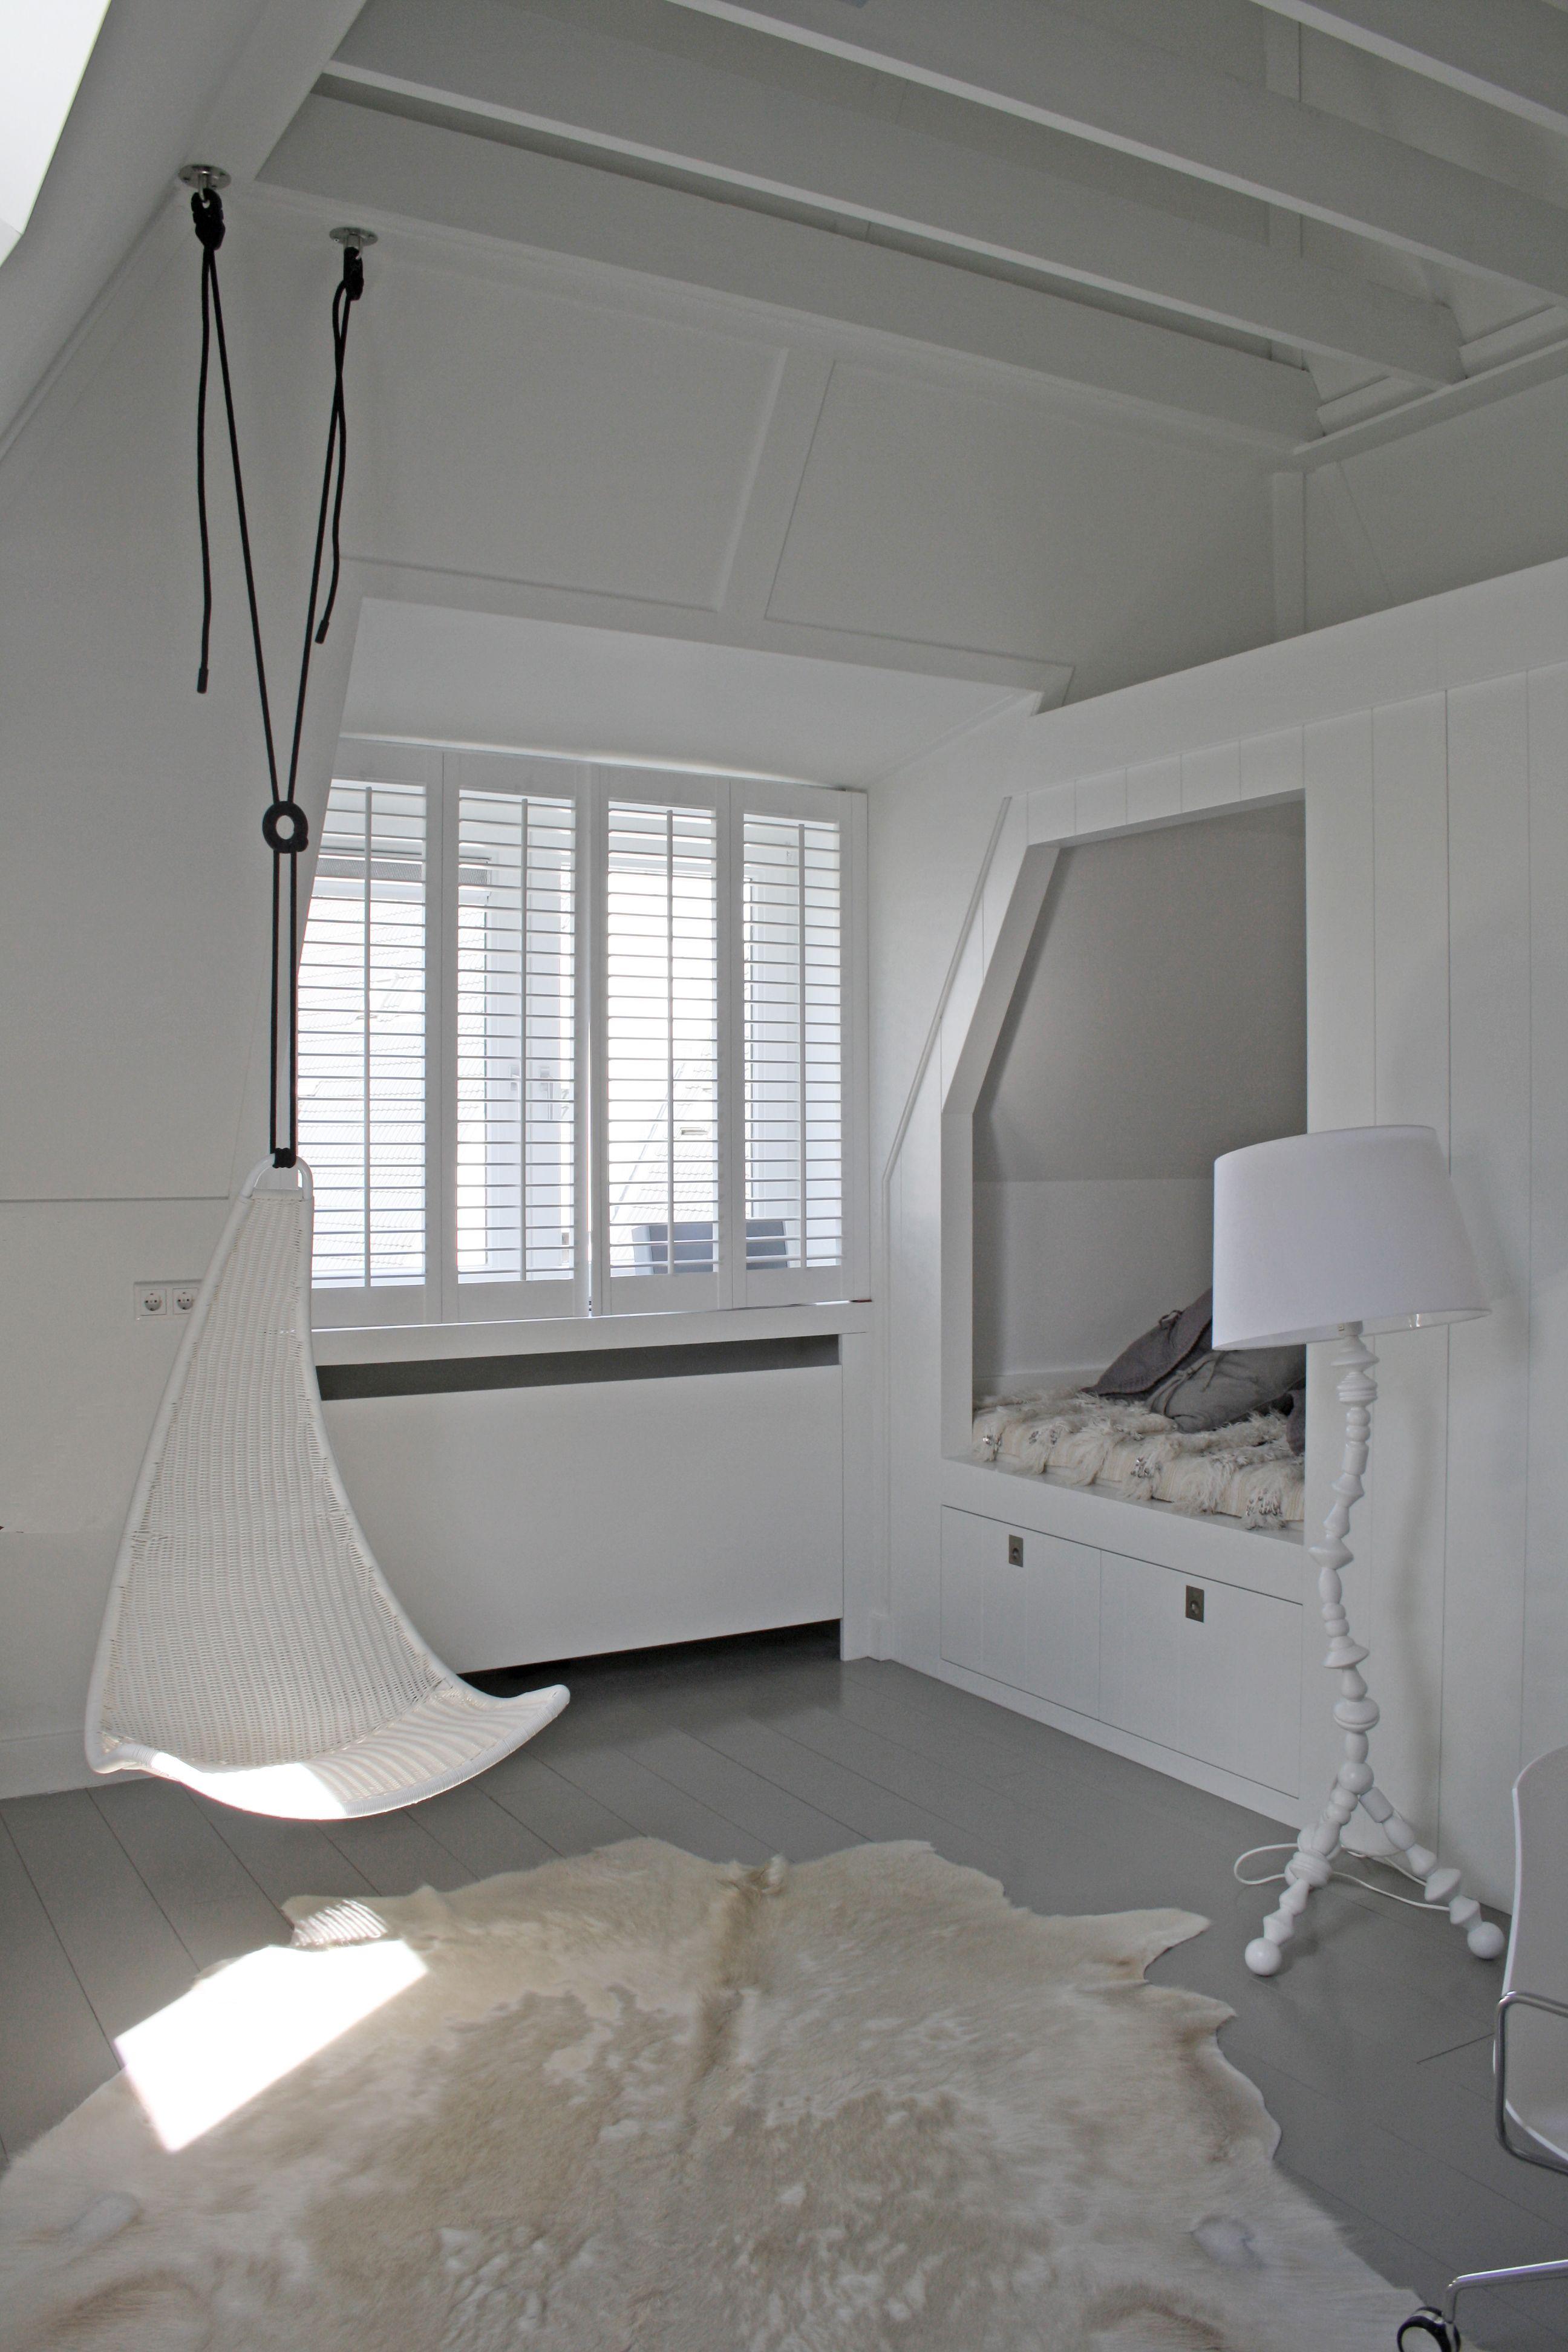 1000+ images about Roos haar kamer on Pinterest